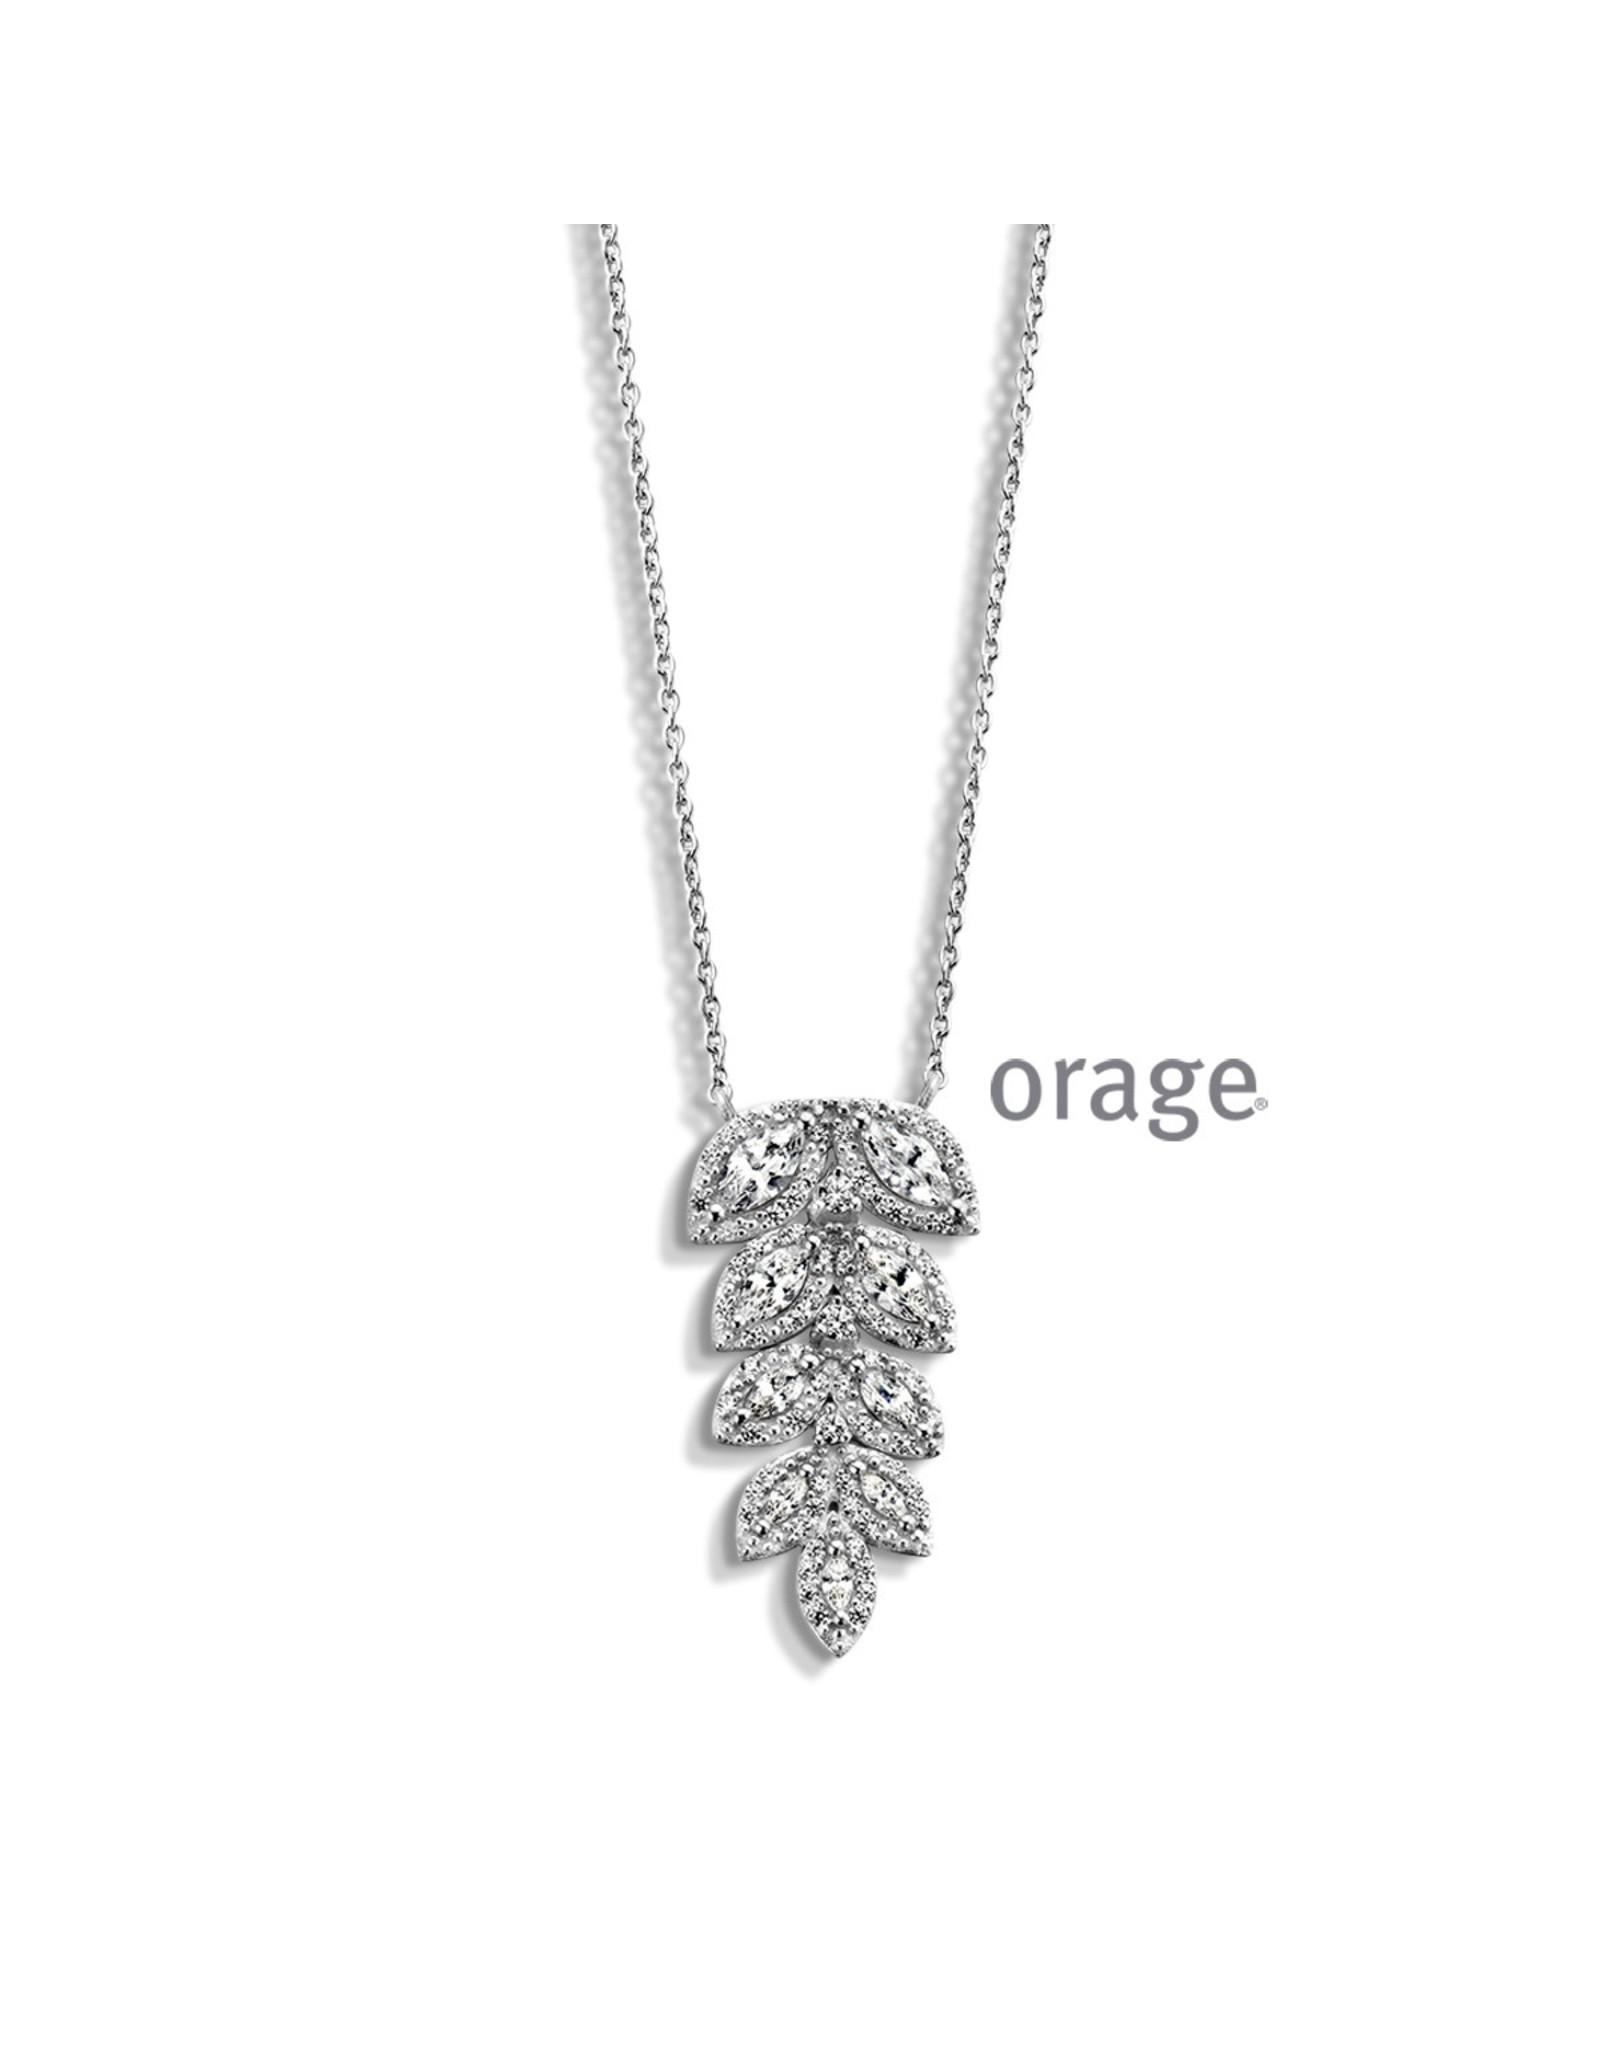 Orage Orage AM016 Halsketting Zilver Zirkonia 45cm